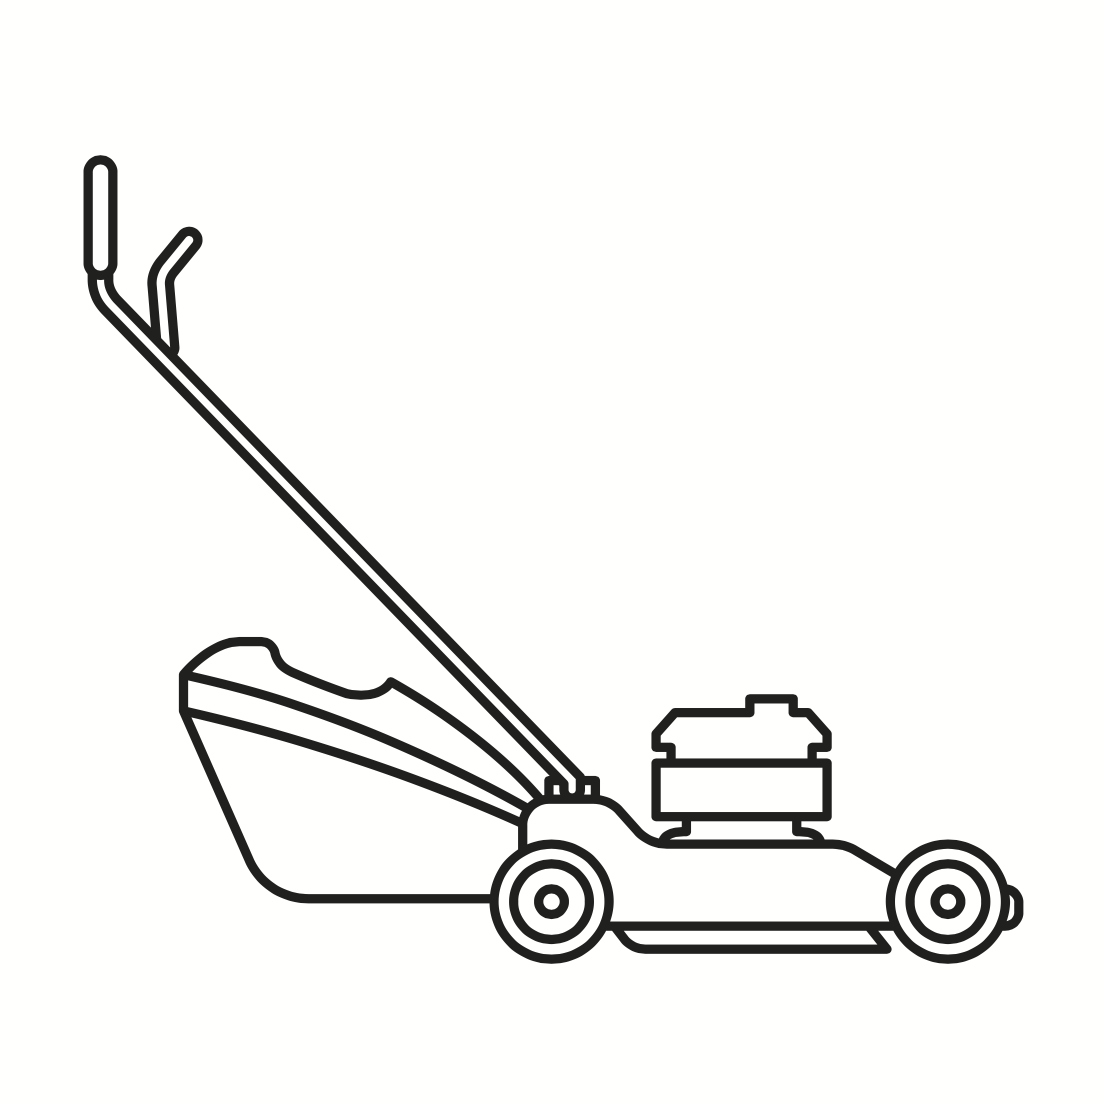 Simple line drawing of a walk-behind lawn mower